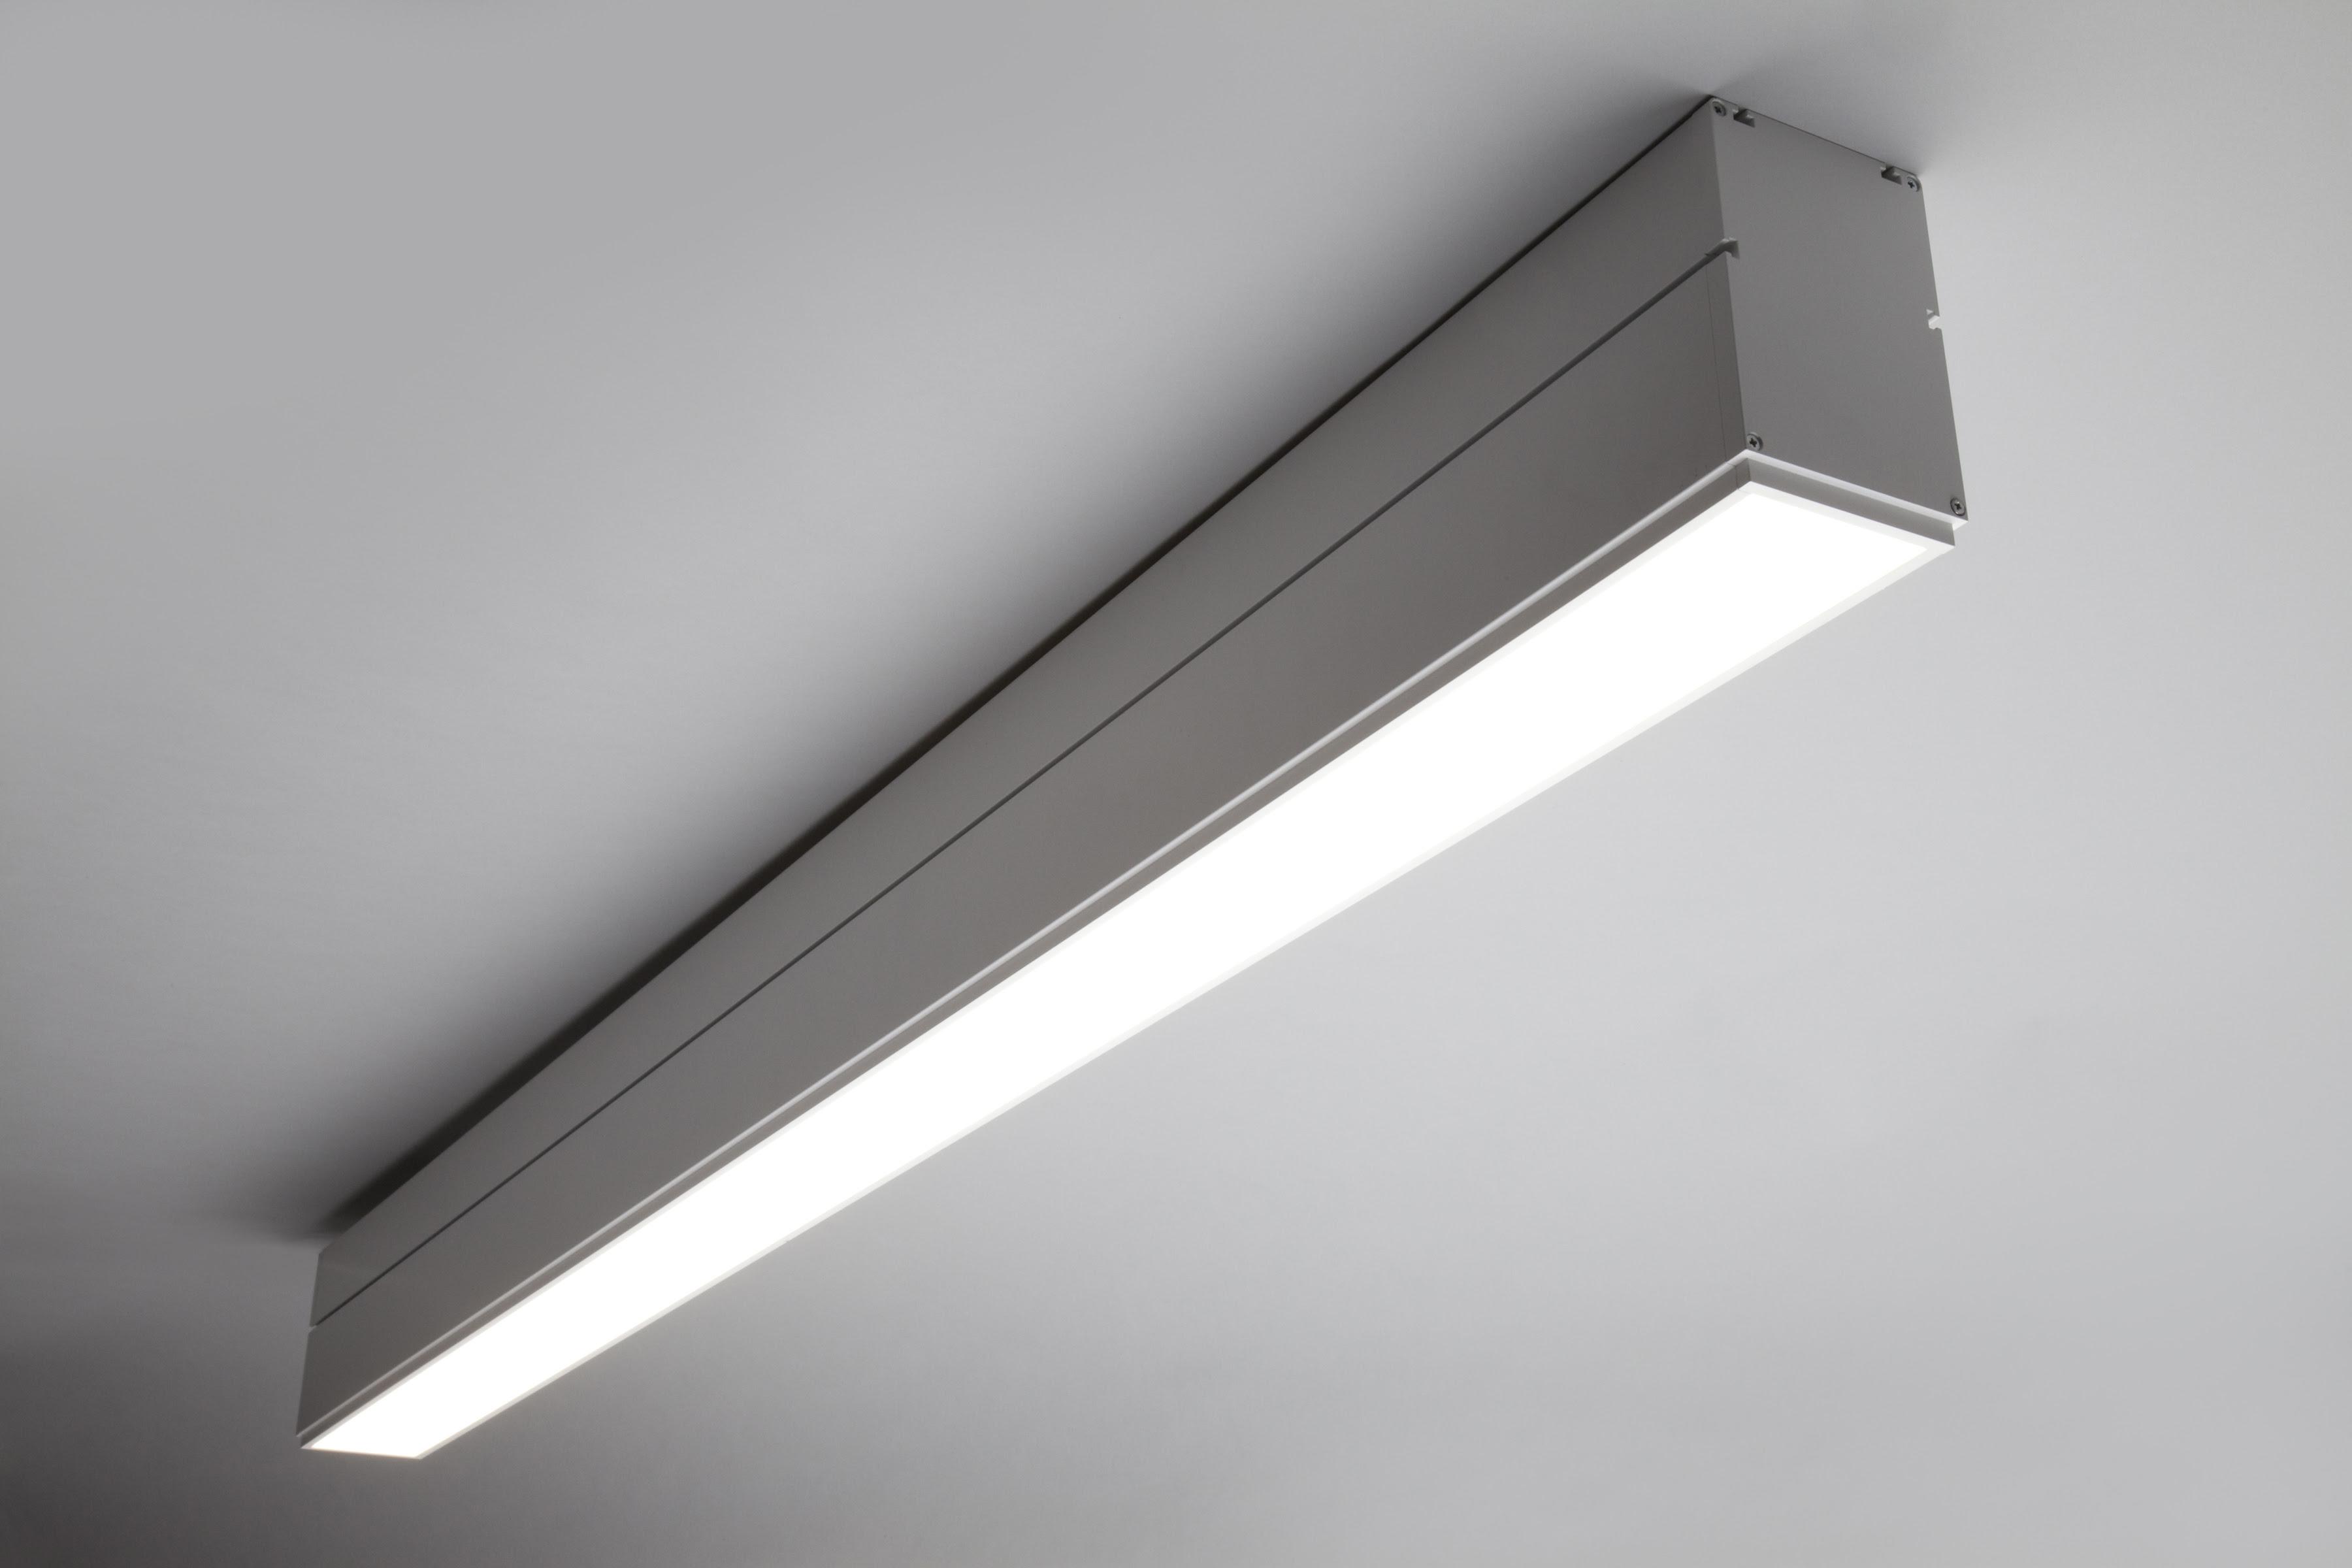 Architectural Linear Suspension Lighting Commercialgrade U S